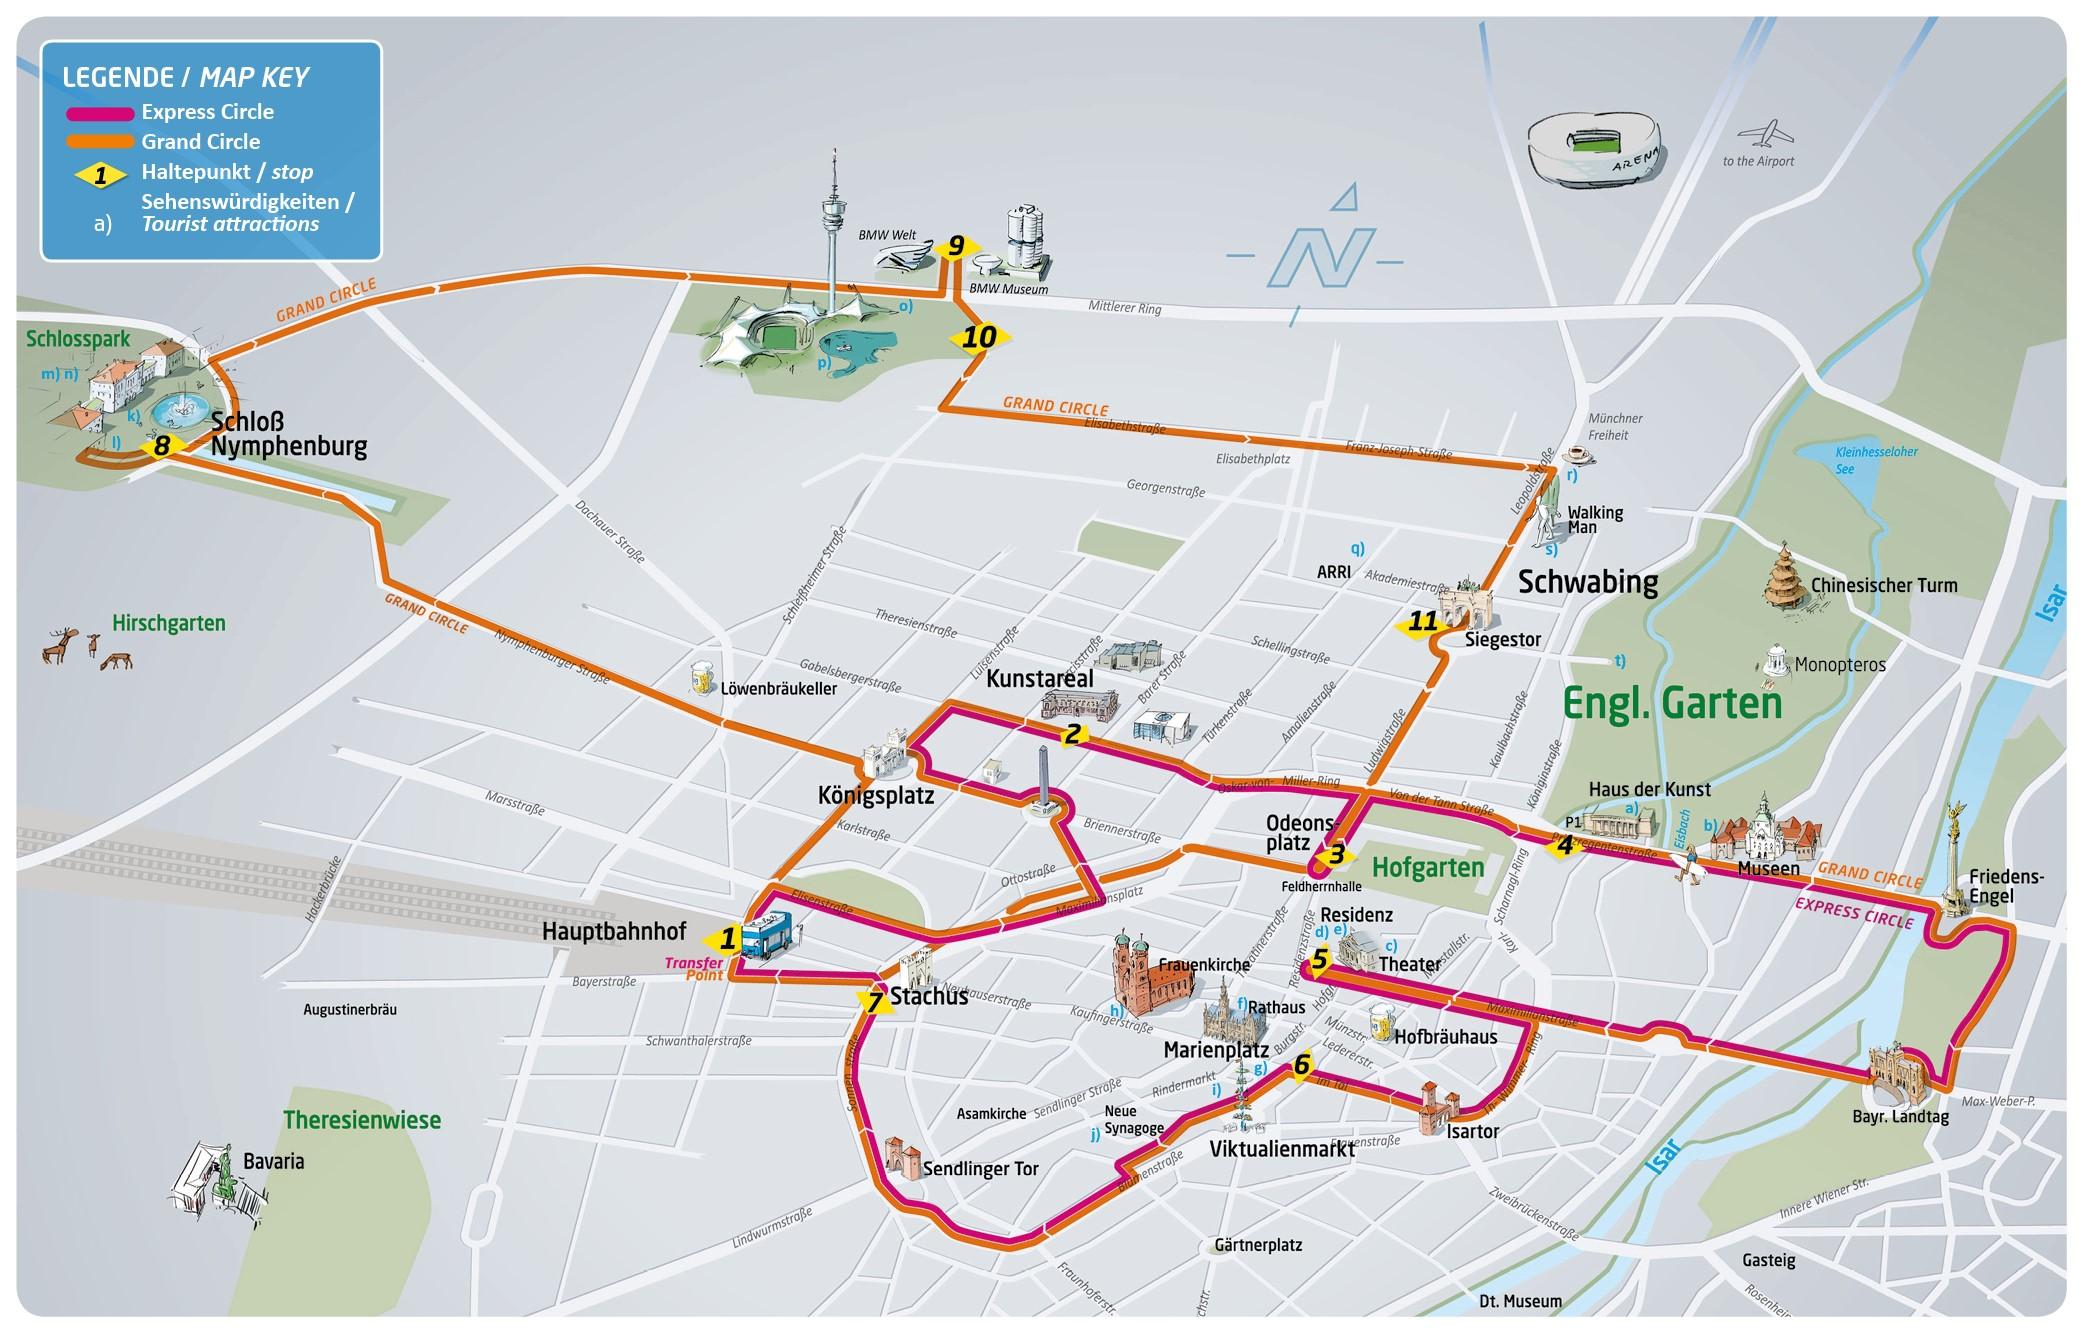 Gray Line Sightseeing Tours Munich